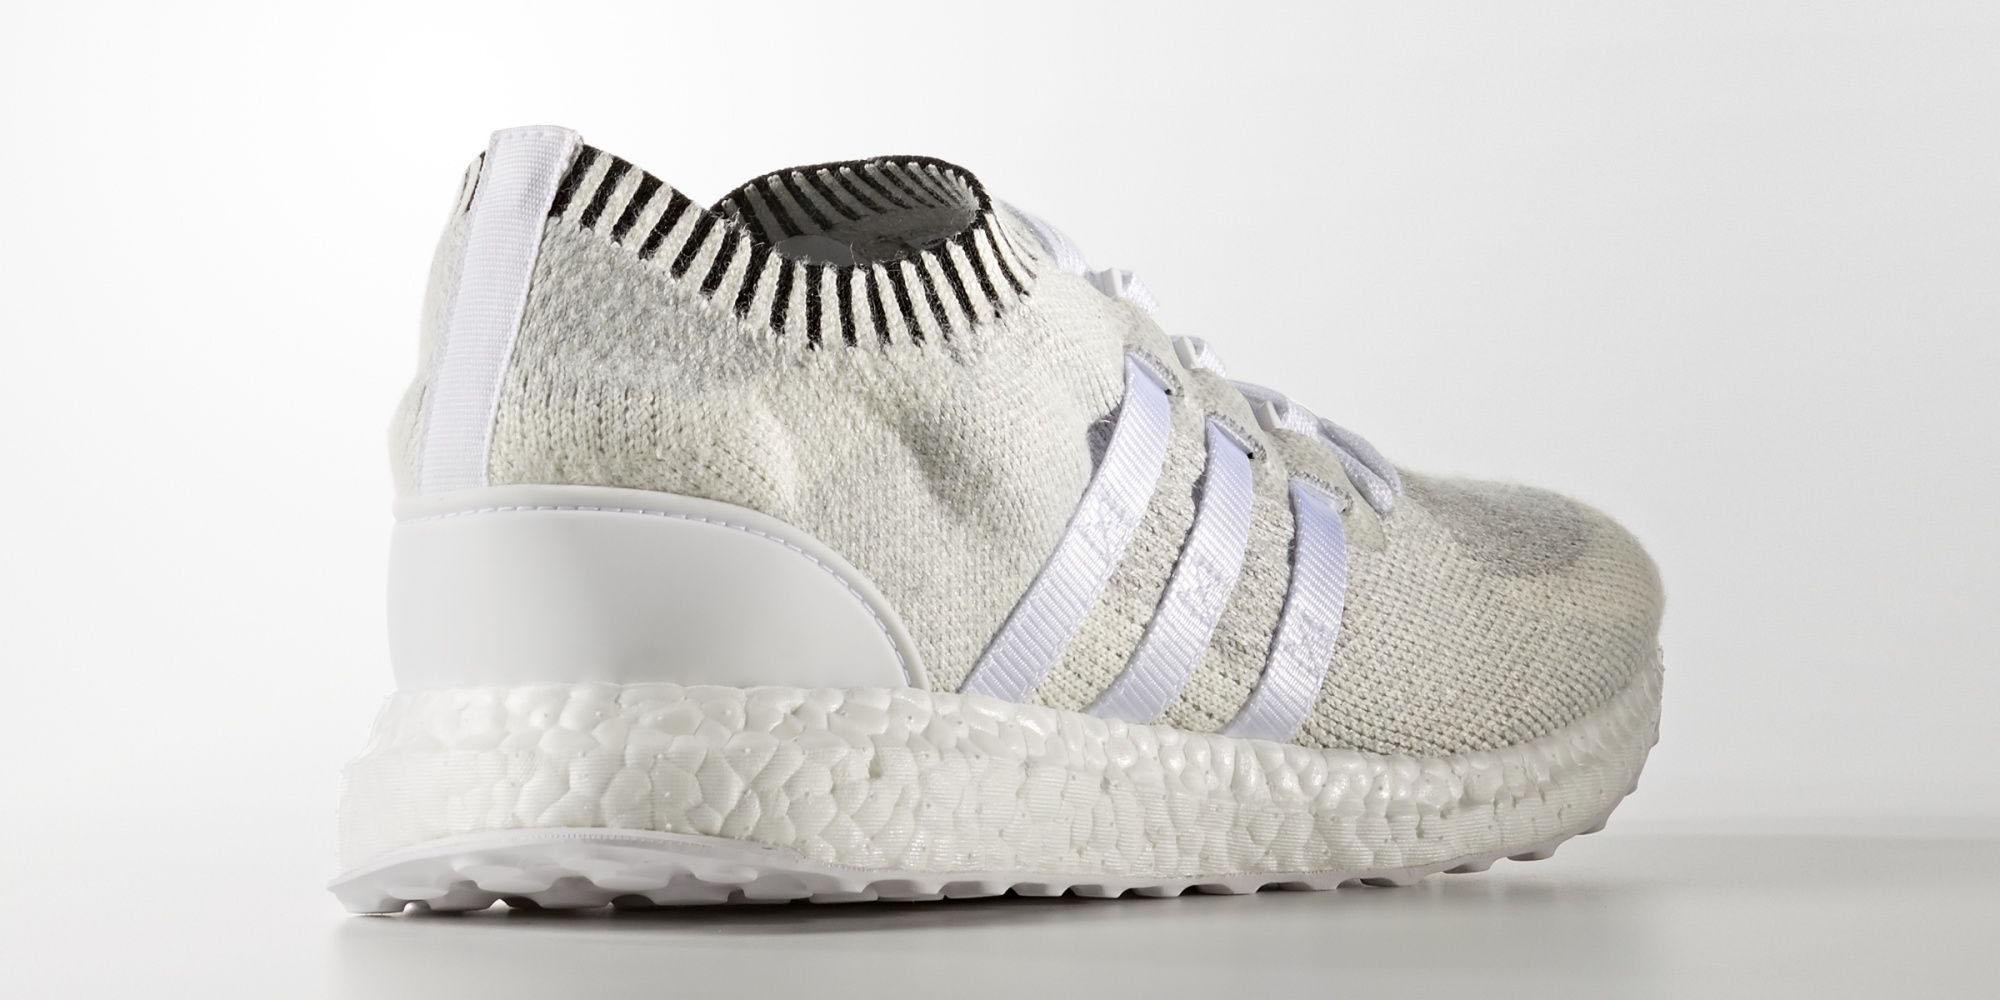 Adidas EQT Support Ultra Primeknit Vintage White